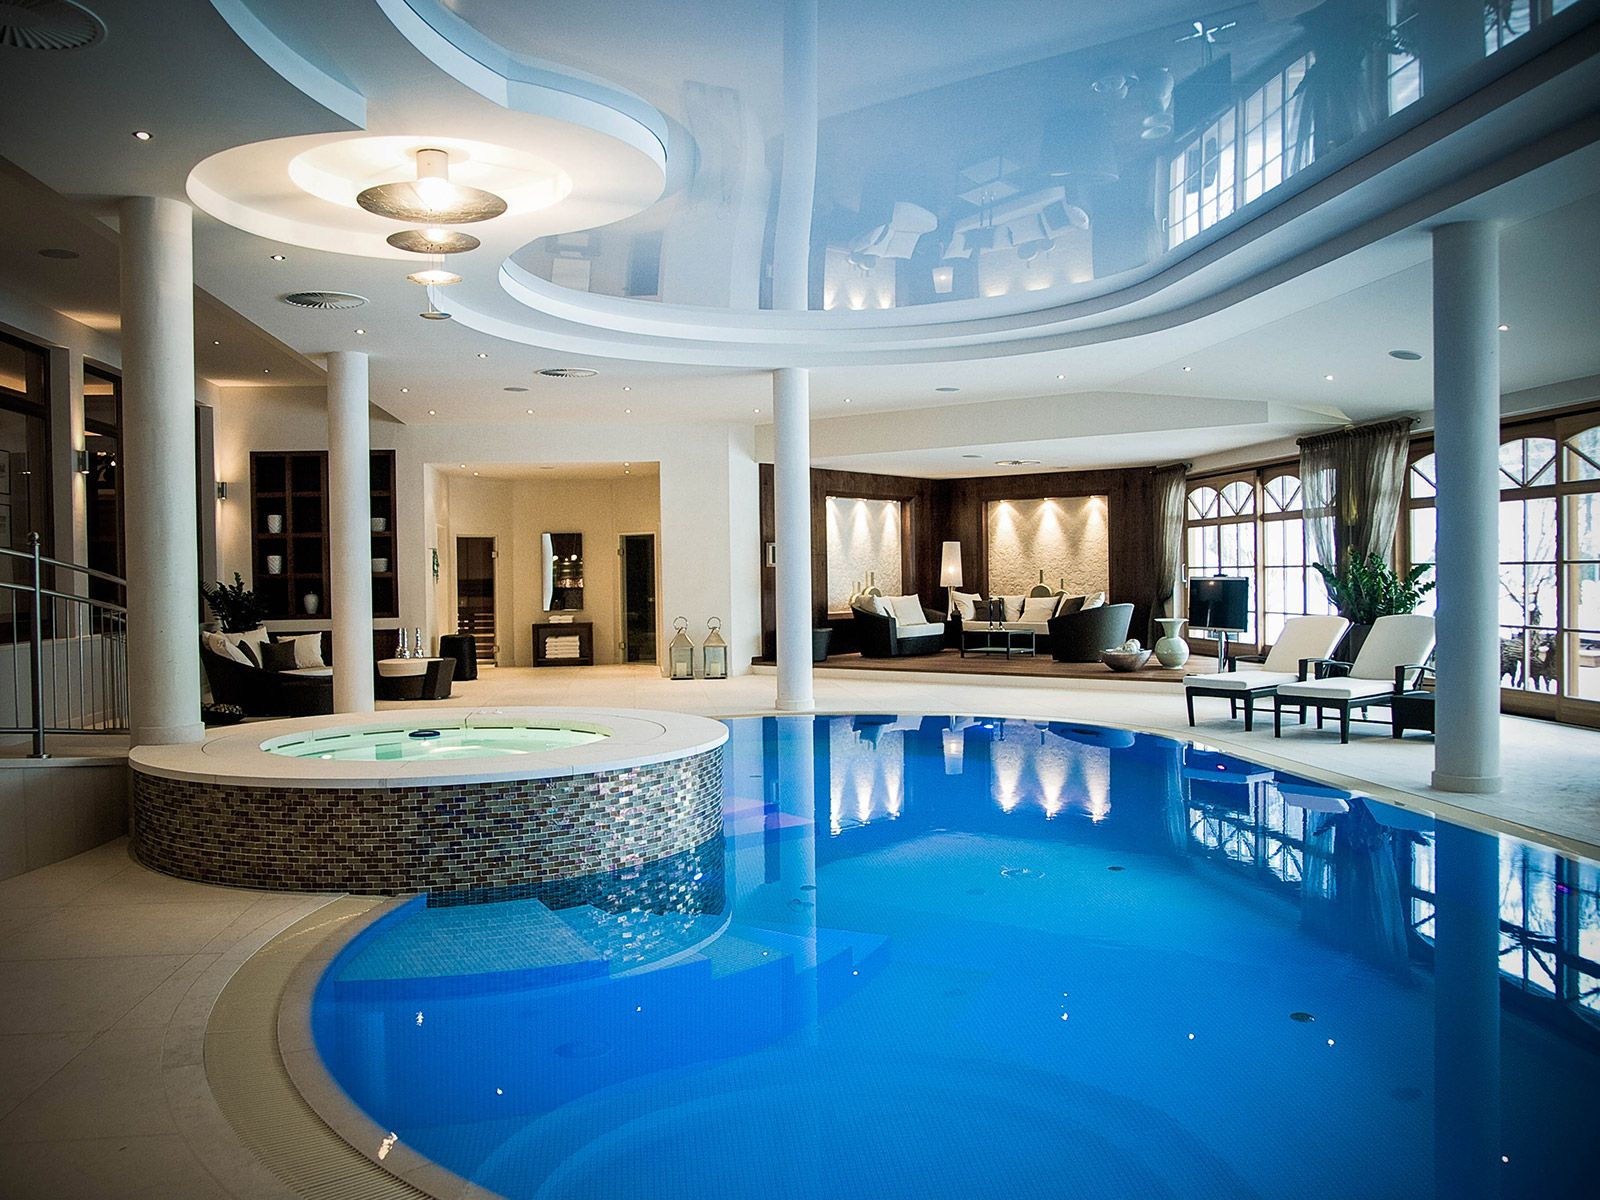 Luxury House Plans With Pools Inside Billionaire Homes Www Pixshark Com Images